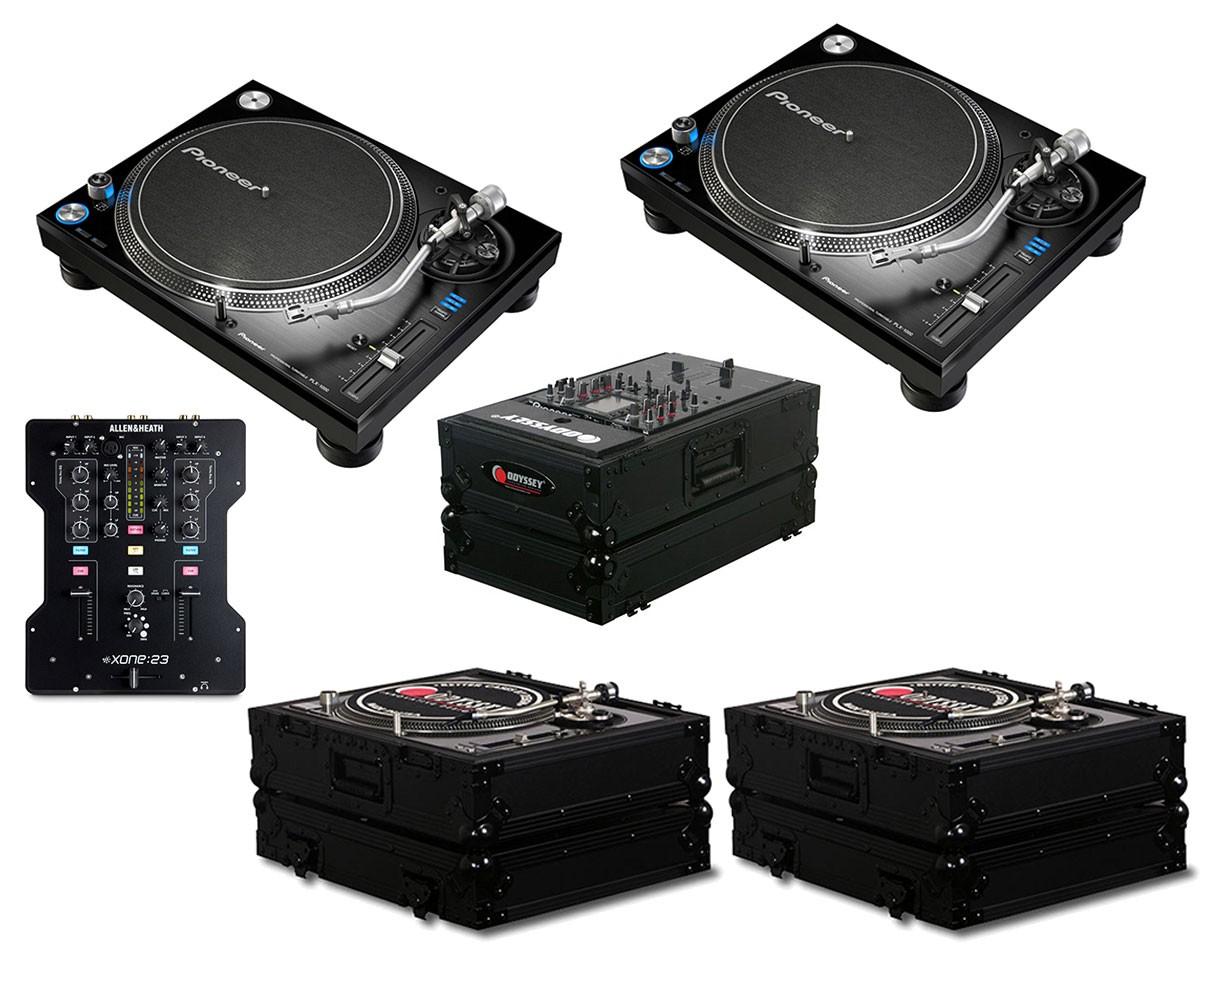 2x Pioneer PLX-1000 + Xone:23 + Odyssey Black Label Cases